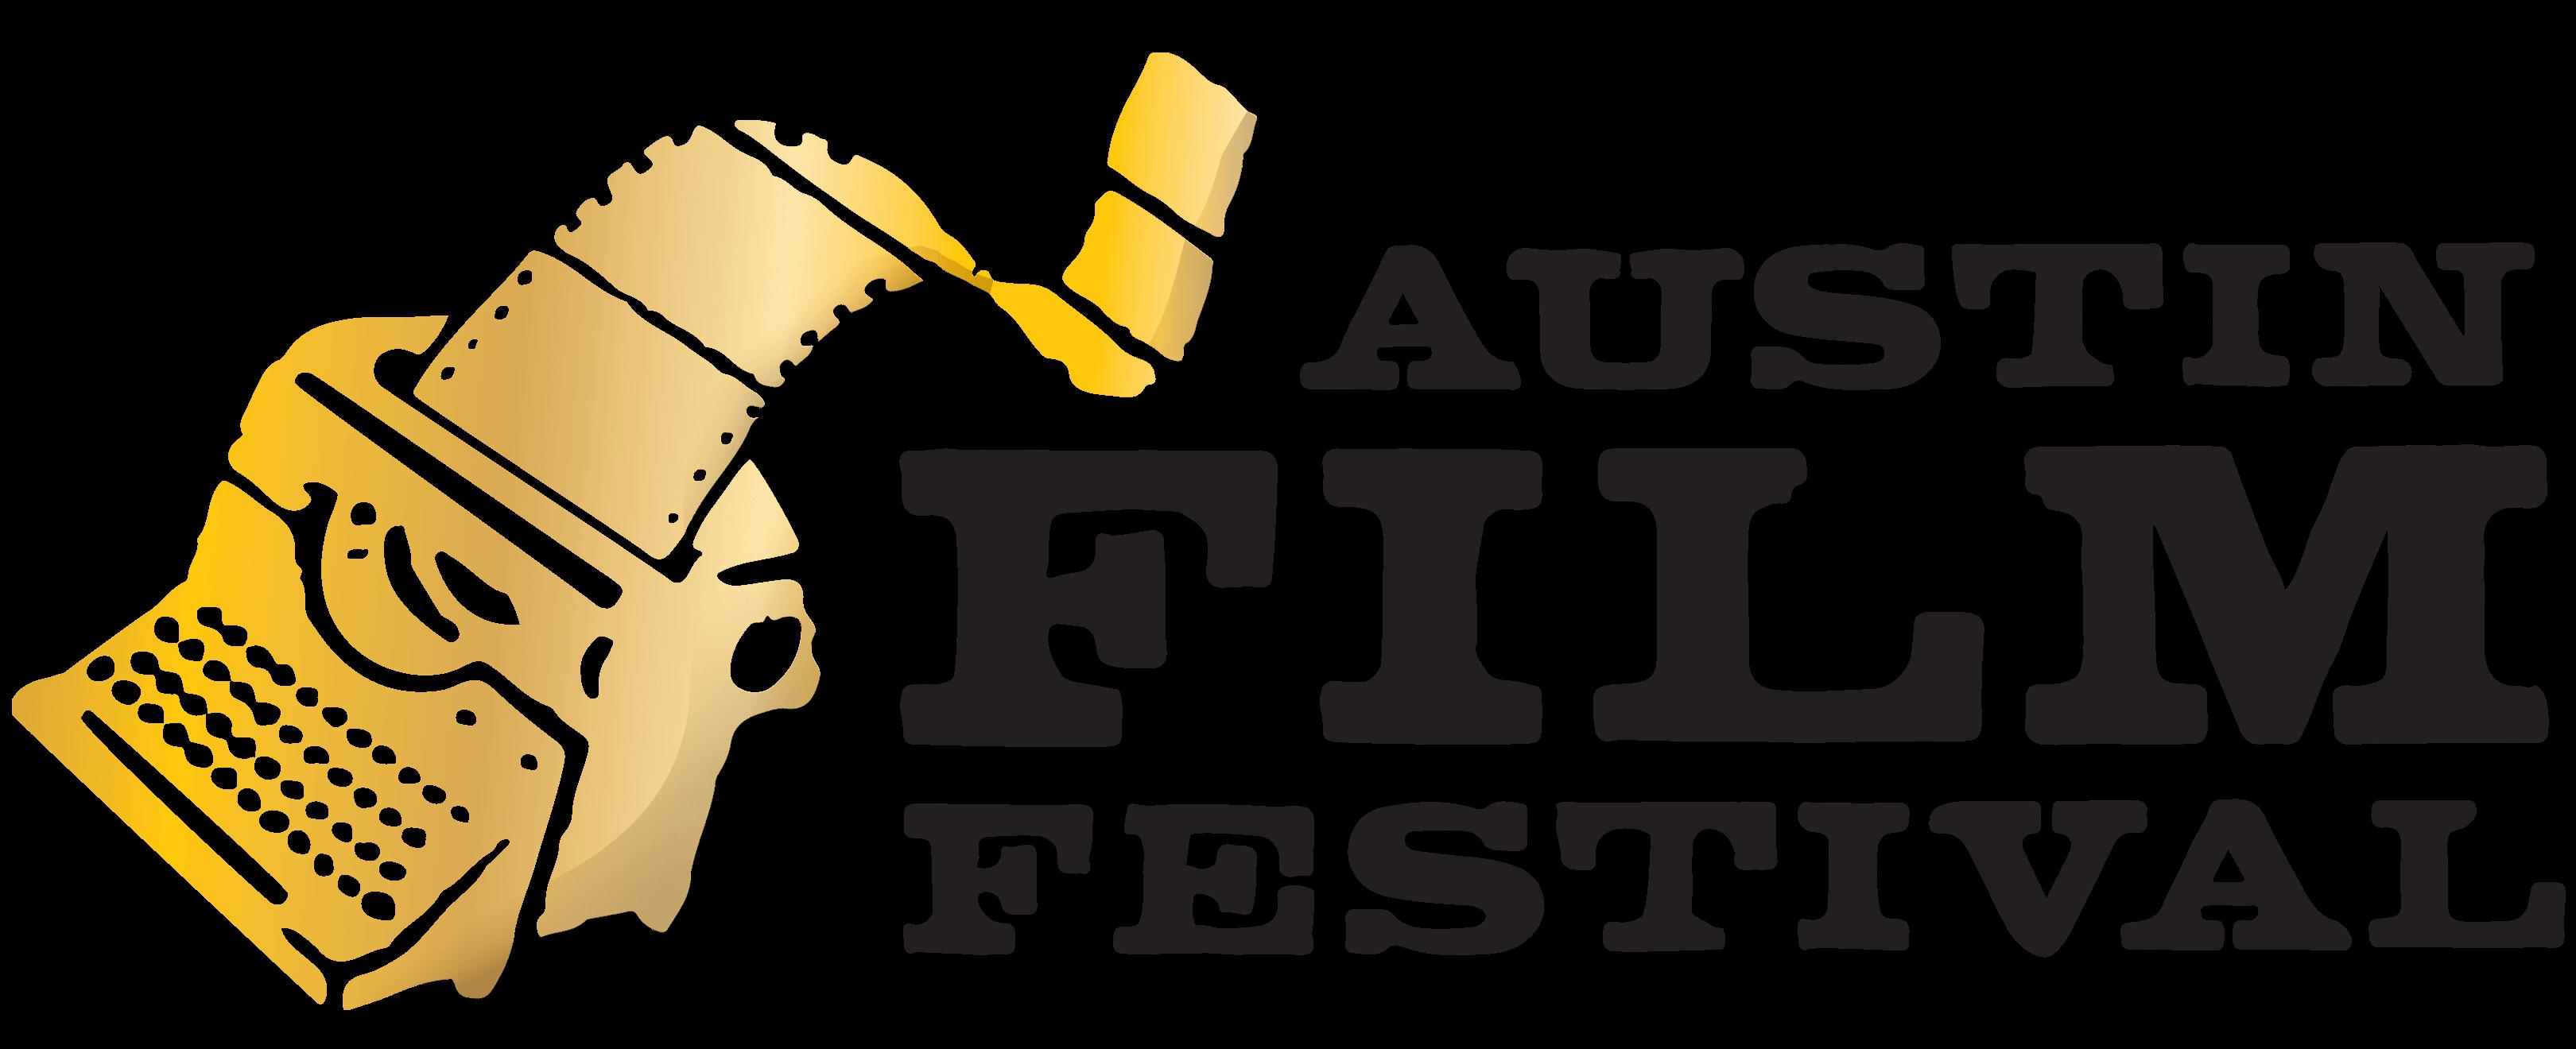 Best Screenwriting Contests - Austin Film Festival